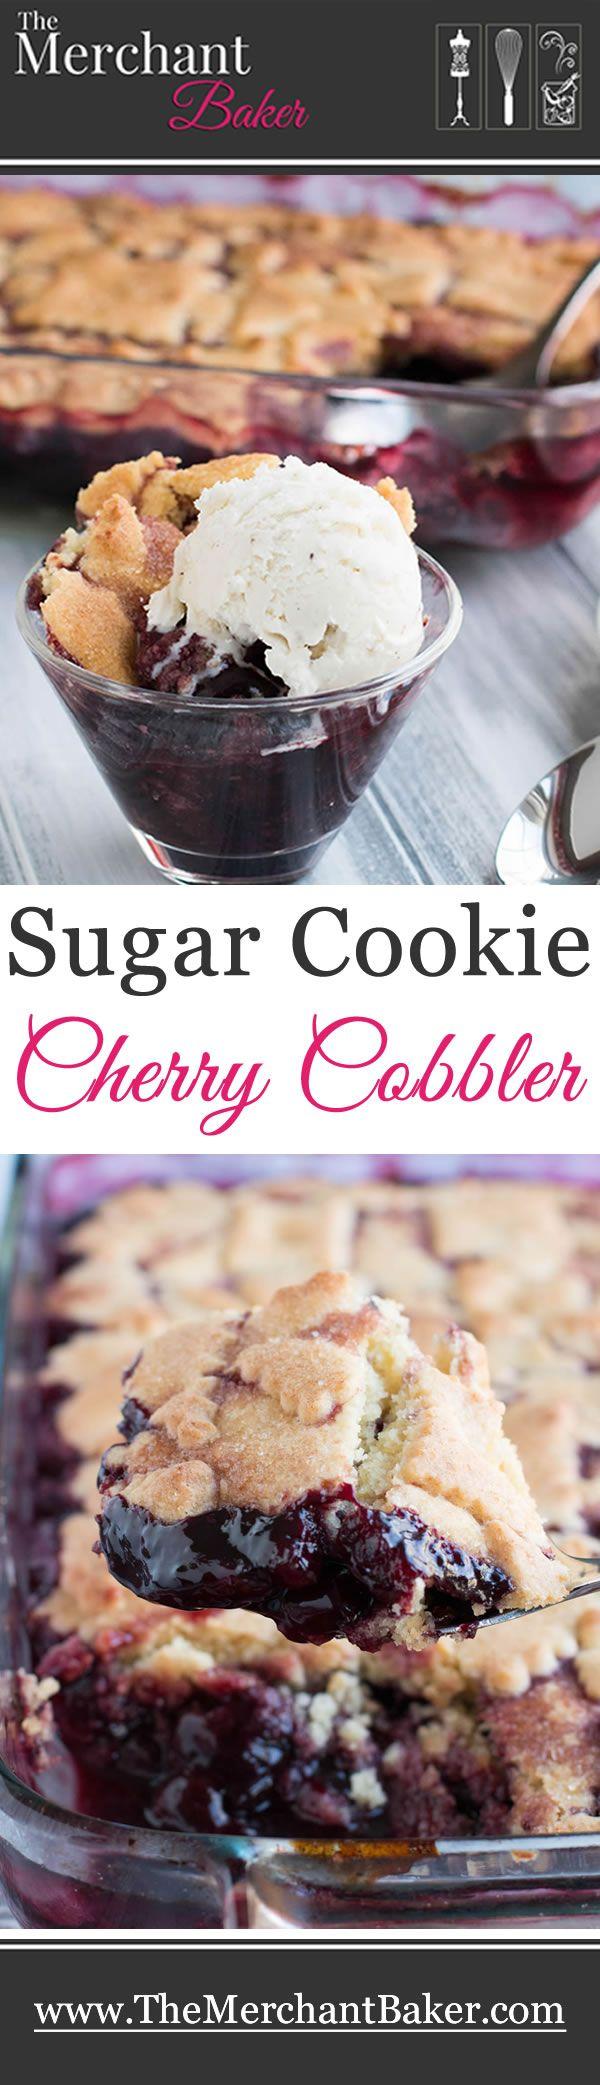 Sugar Cookie Cherry Cobbler. Sweet, juicy cherries bake beneath a tender, yet crispy crust of buttery sugar cookies. A fun twist on traditional cobbler!